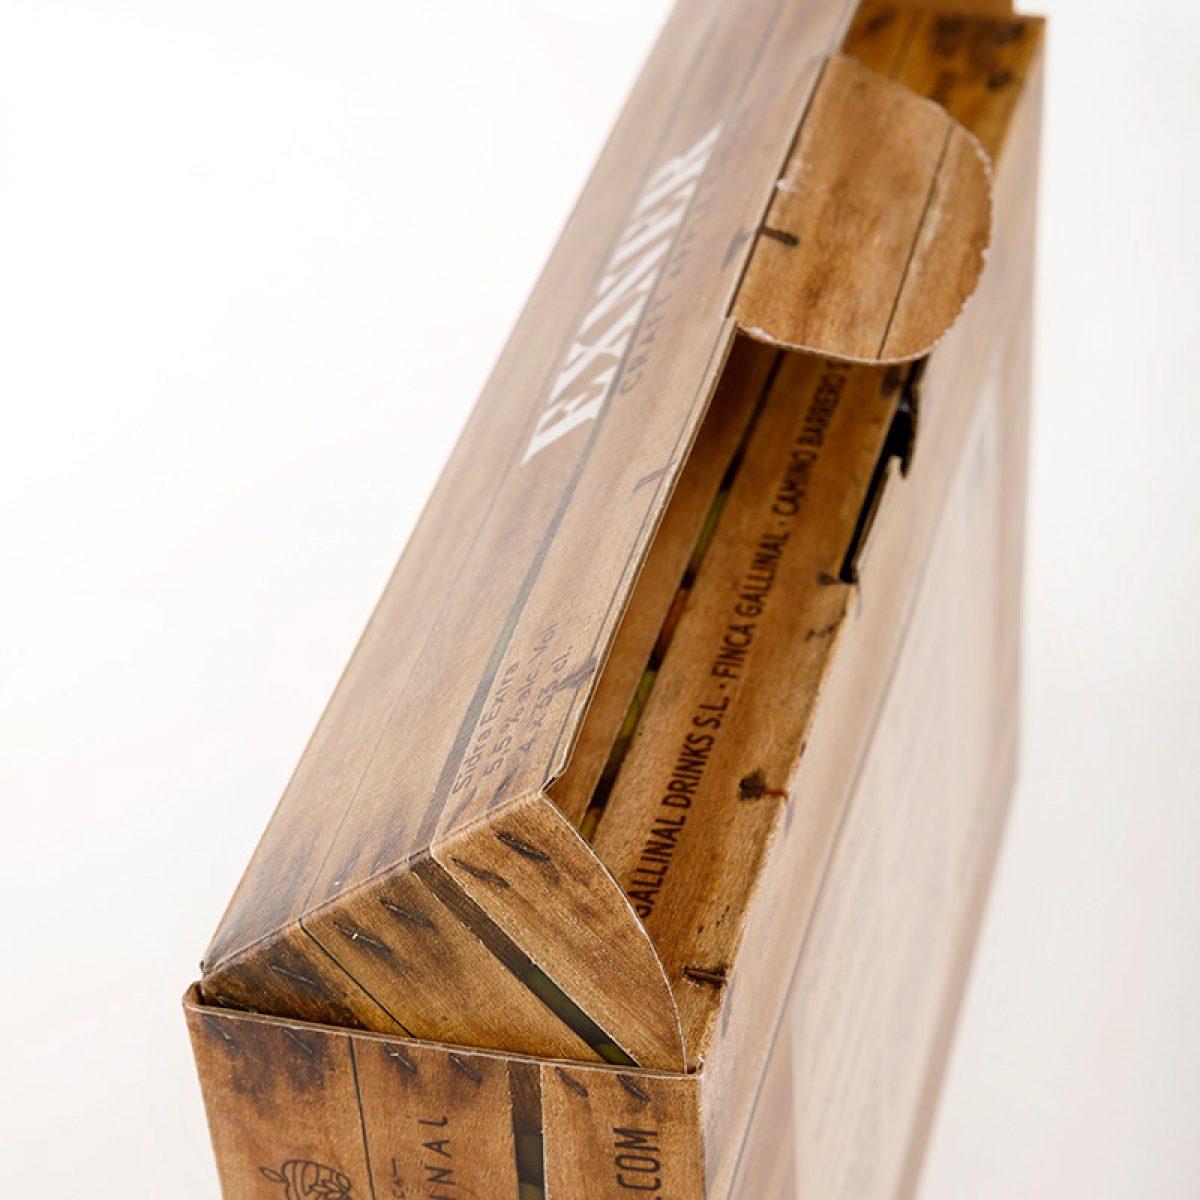 Packaging de sidra EXNER